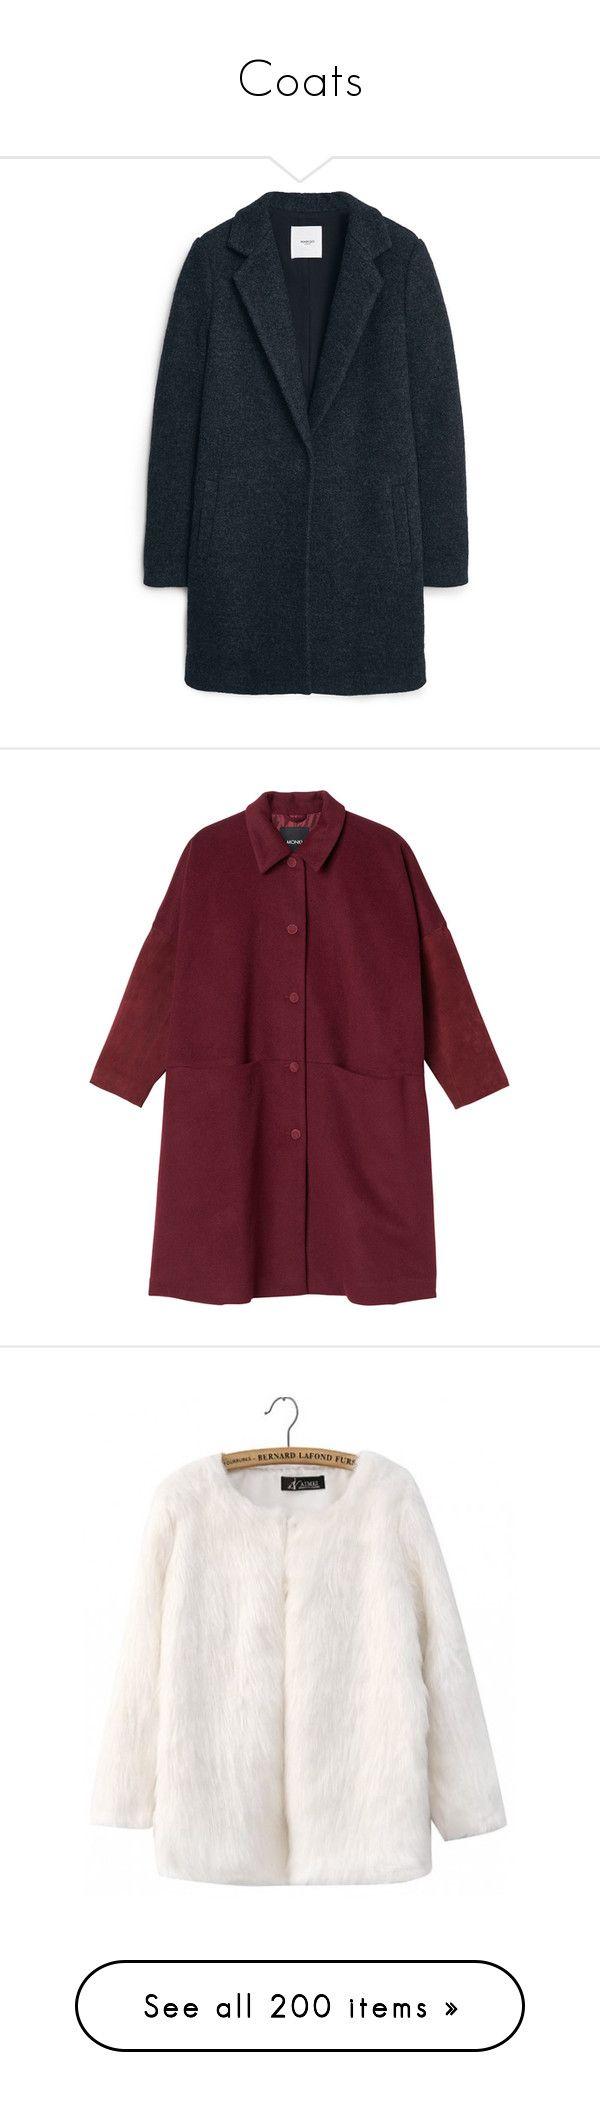 """Coats"" by hetasdfghjkl ❤ liked on Polyvore featuring outerwear, coats, jackets, coats & jackets, mango coats, blue coat, fur-lined coats, blue wool coats, long sleeve coat and tops"